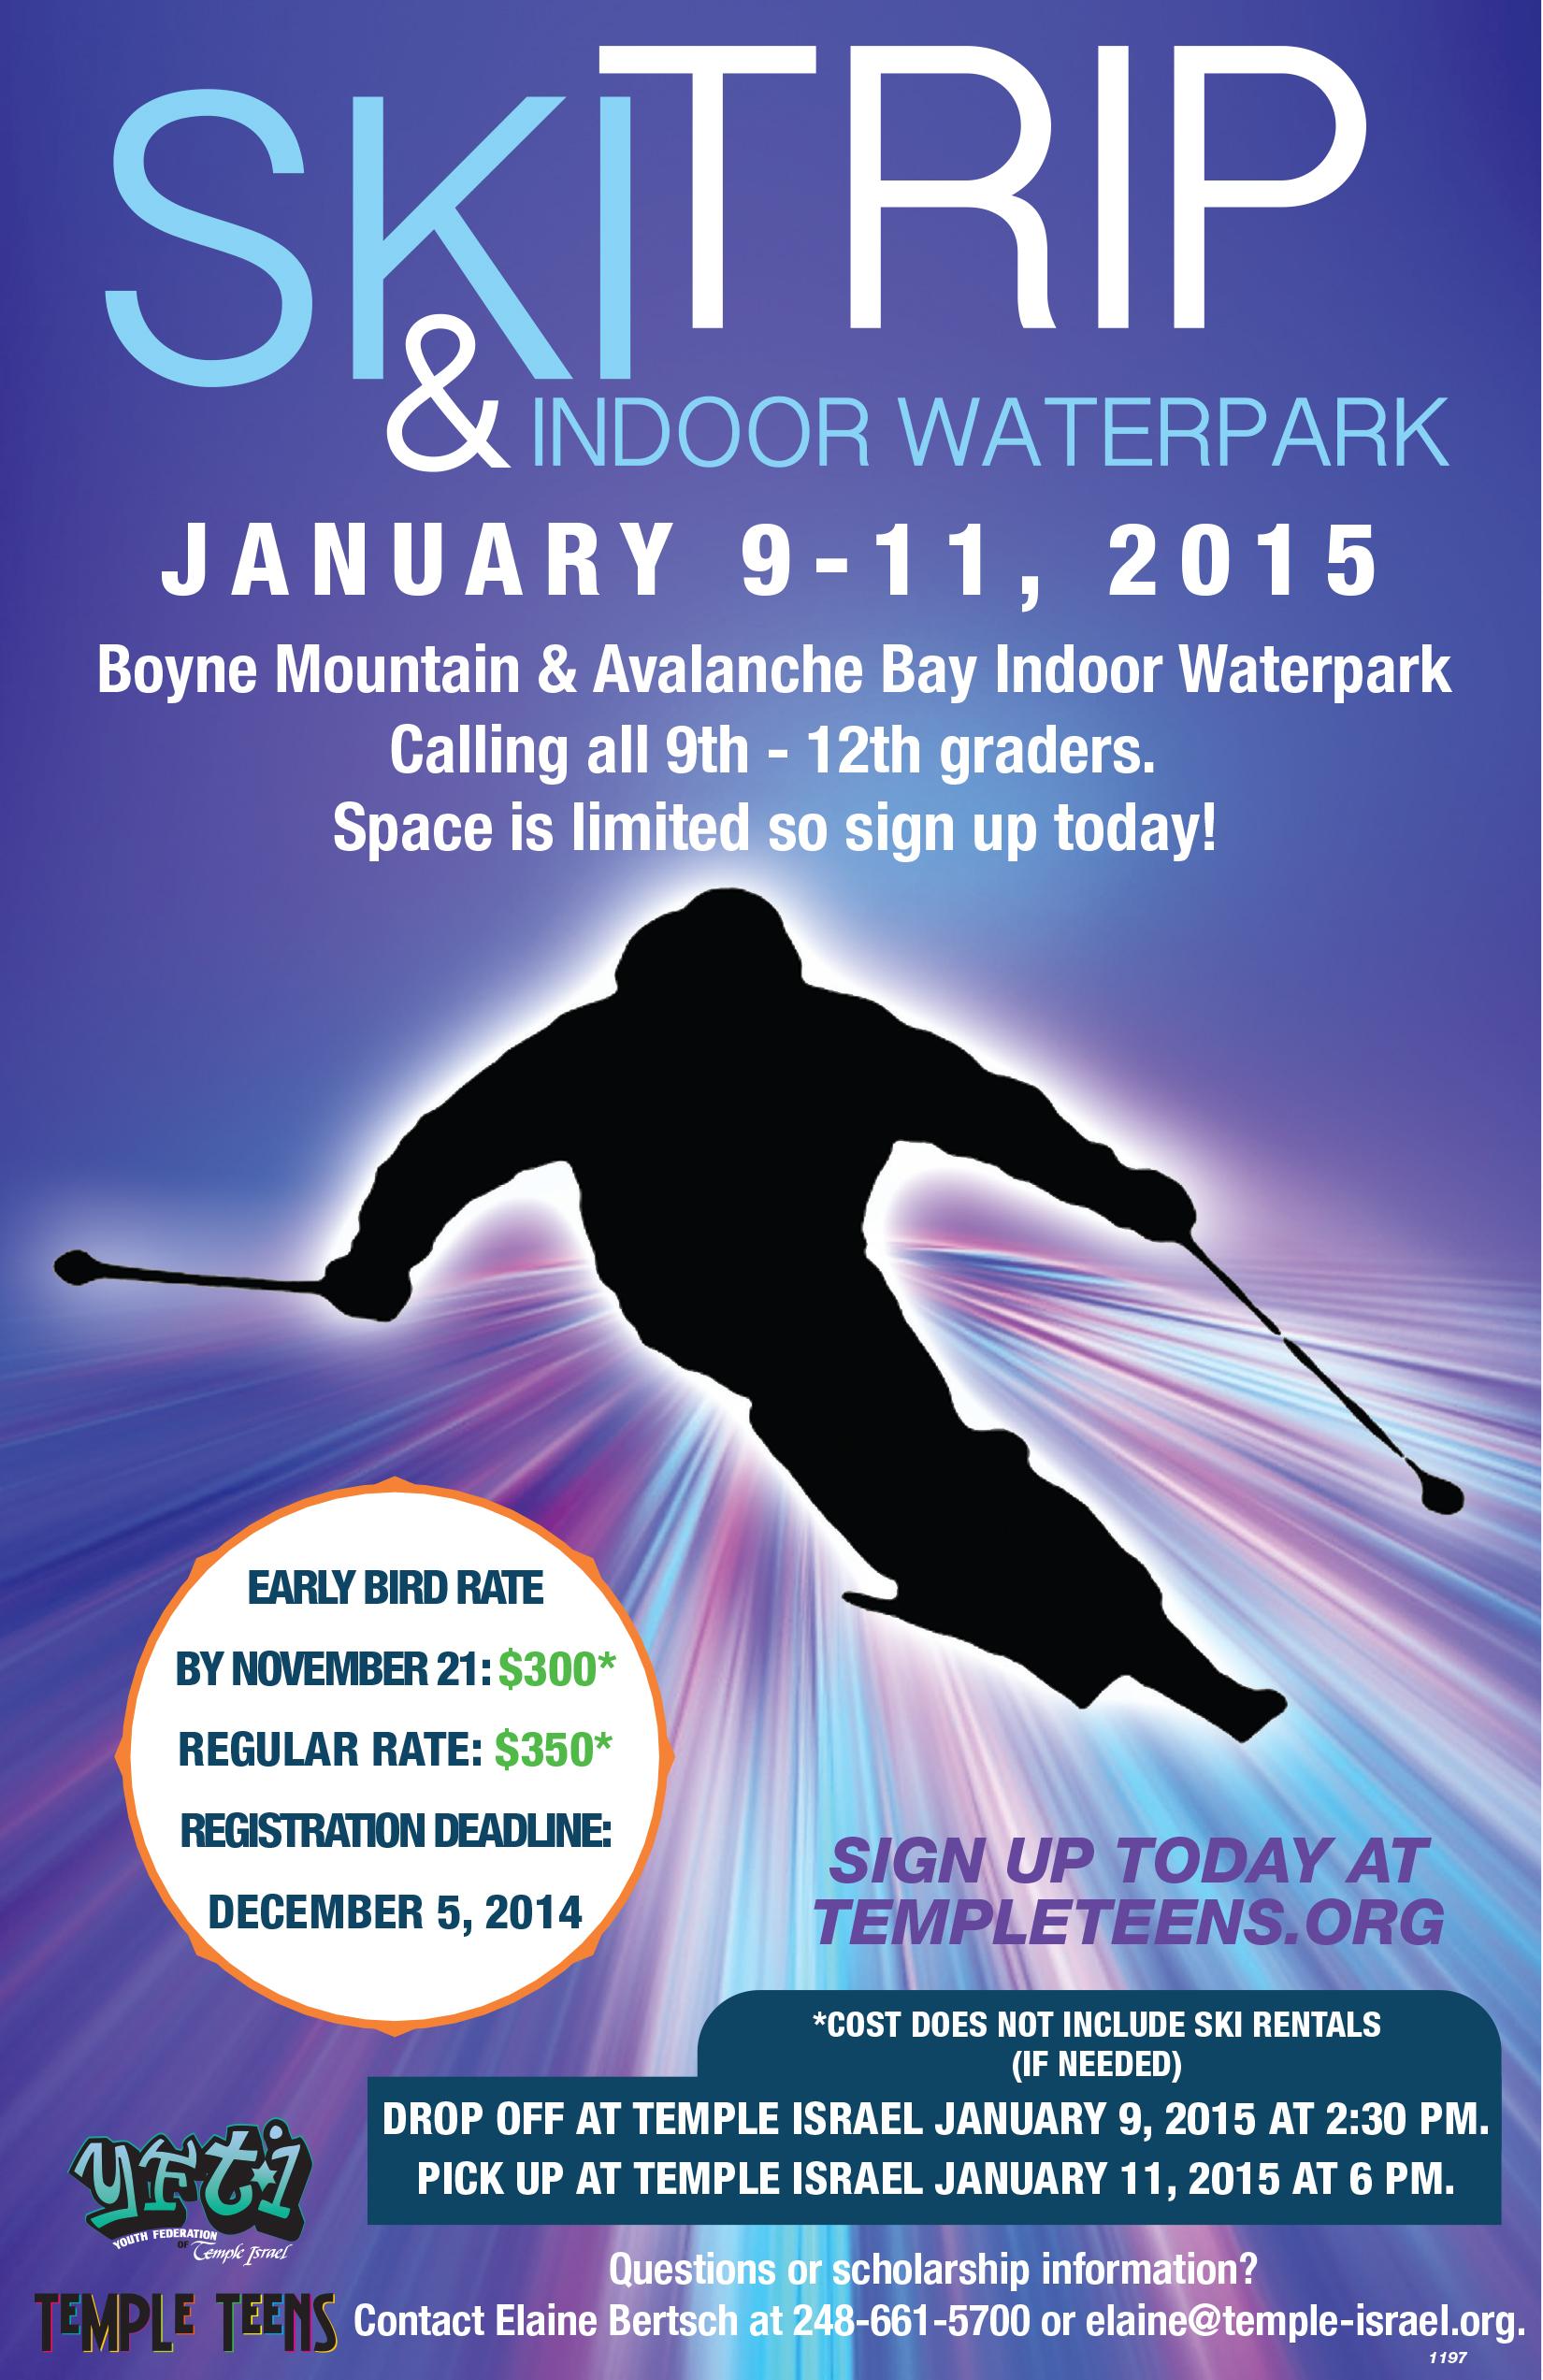 1197 - YFTI ski trip 2015 v2